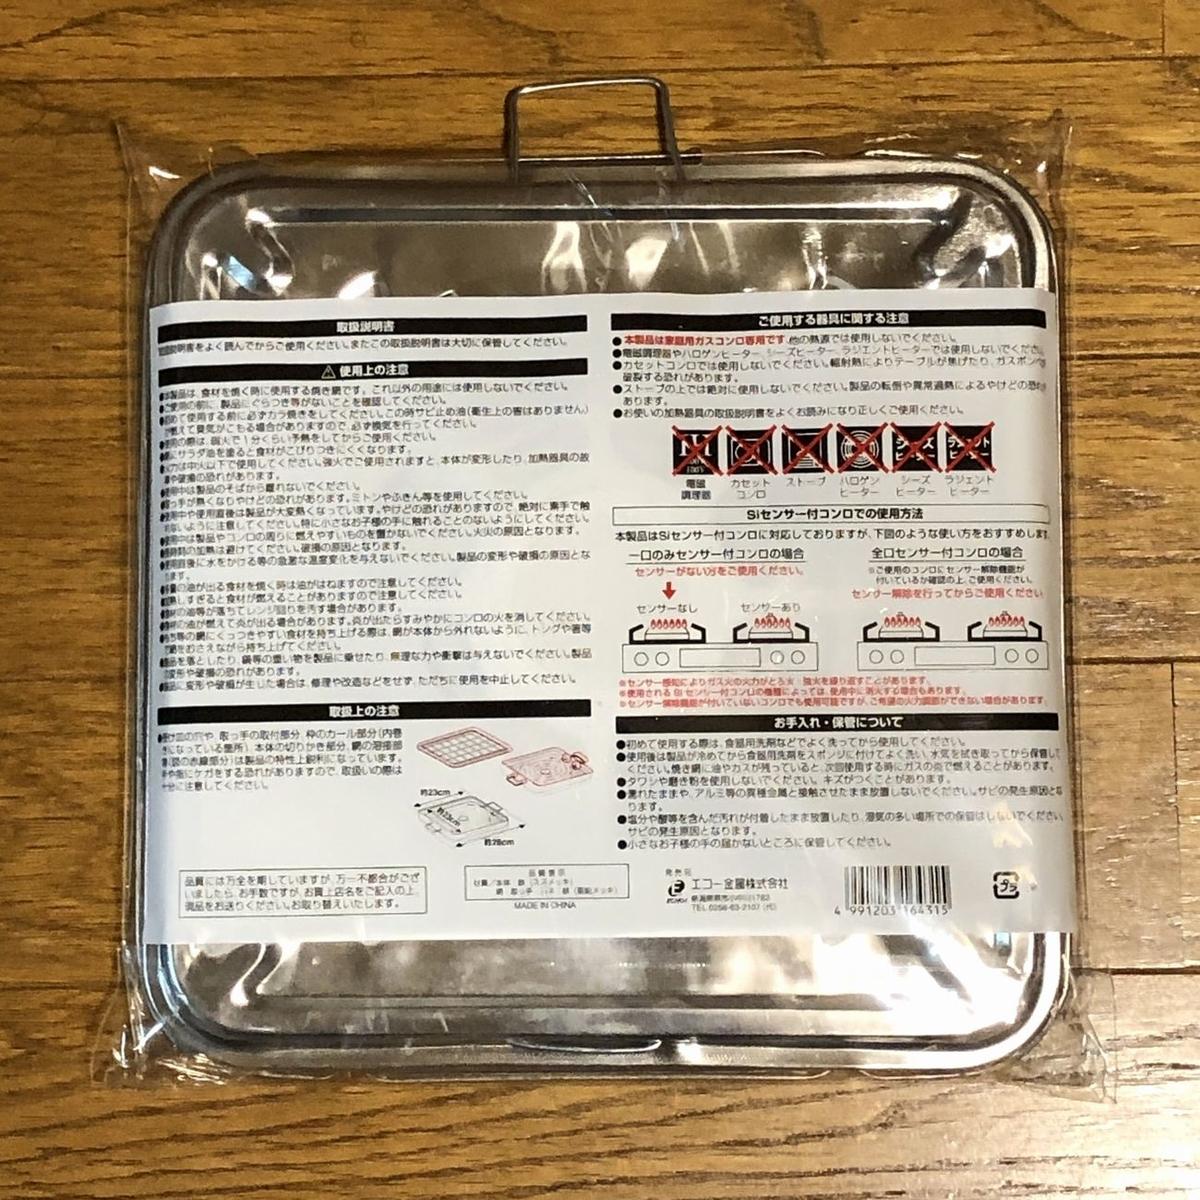 f:id:shiratsume:20191004134511j:plain